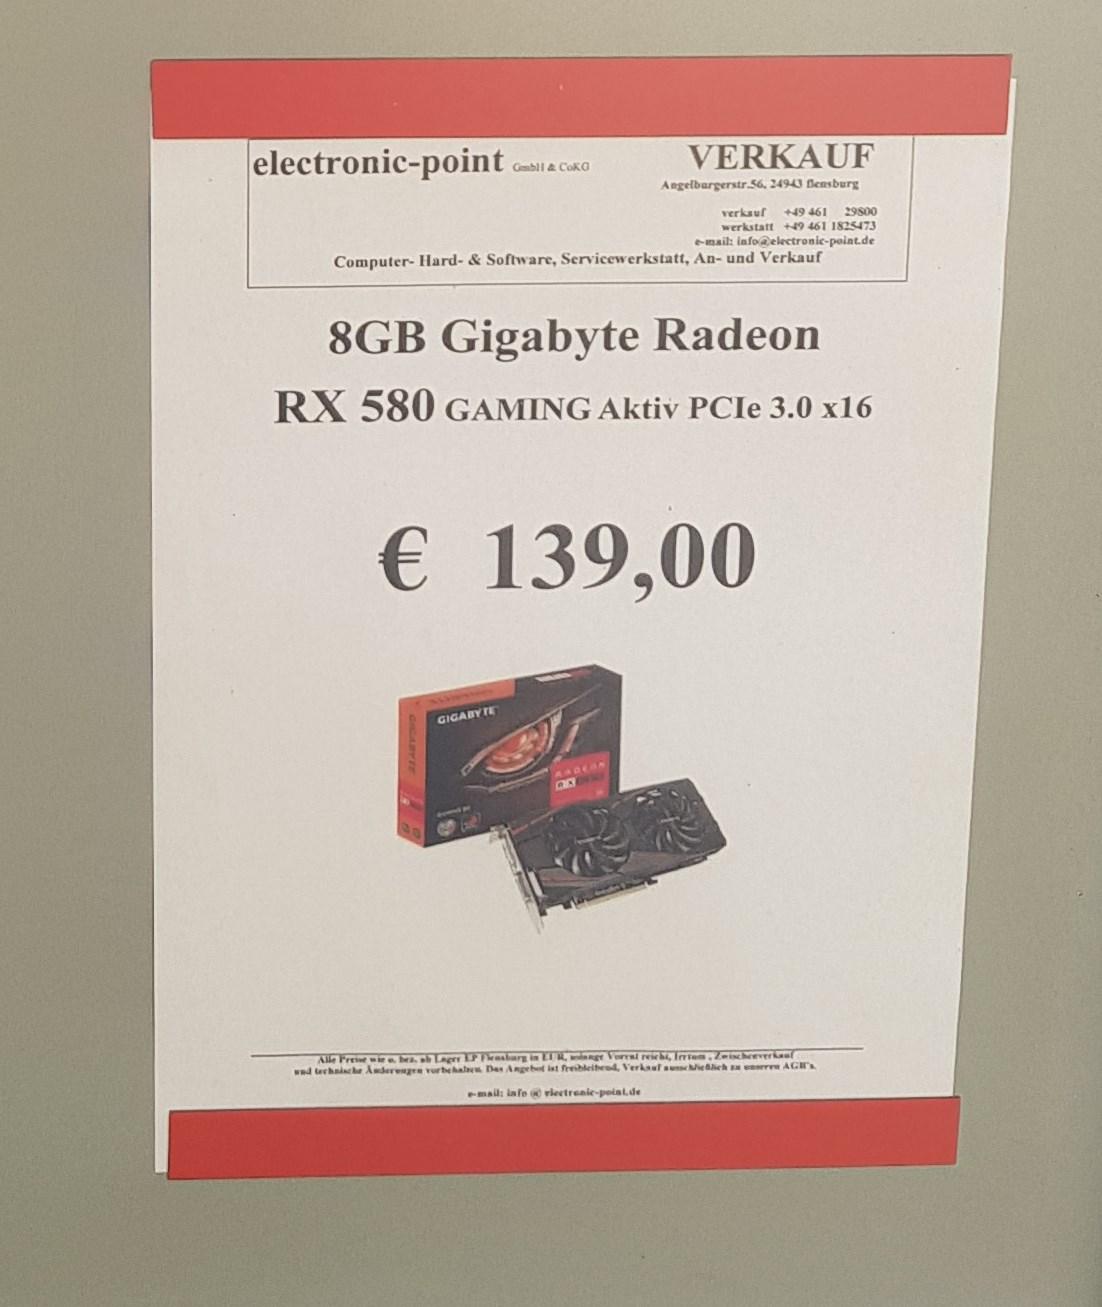 [LOKAL Flensburg electronic-point] 8GB Gigabyte Radeon RX 580 GAMING Aktiv